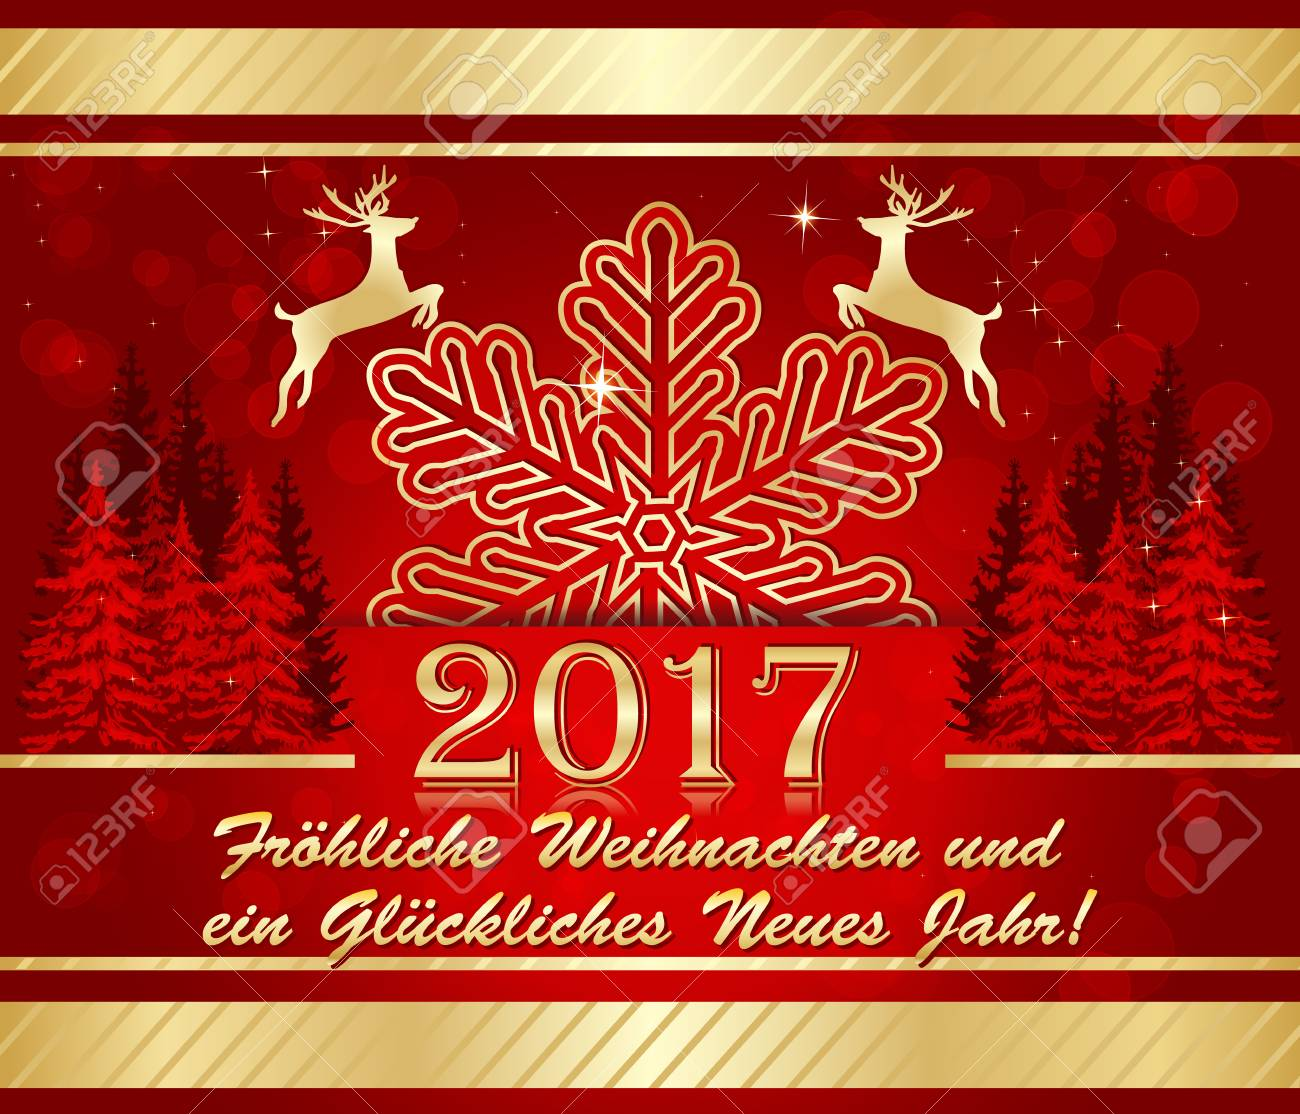 German christmas new year 2017 greeting card merry christmas german christmas new year 2017 greeting card merry christmas and happy new year m4hsunfo